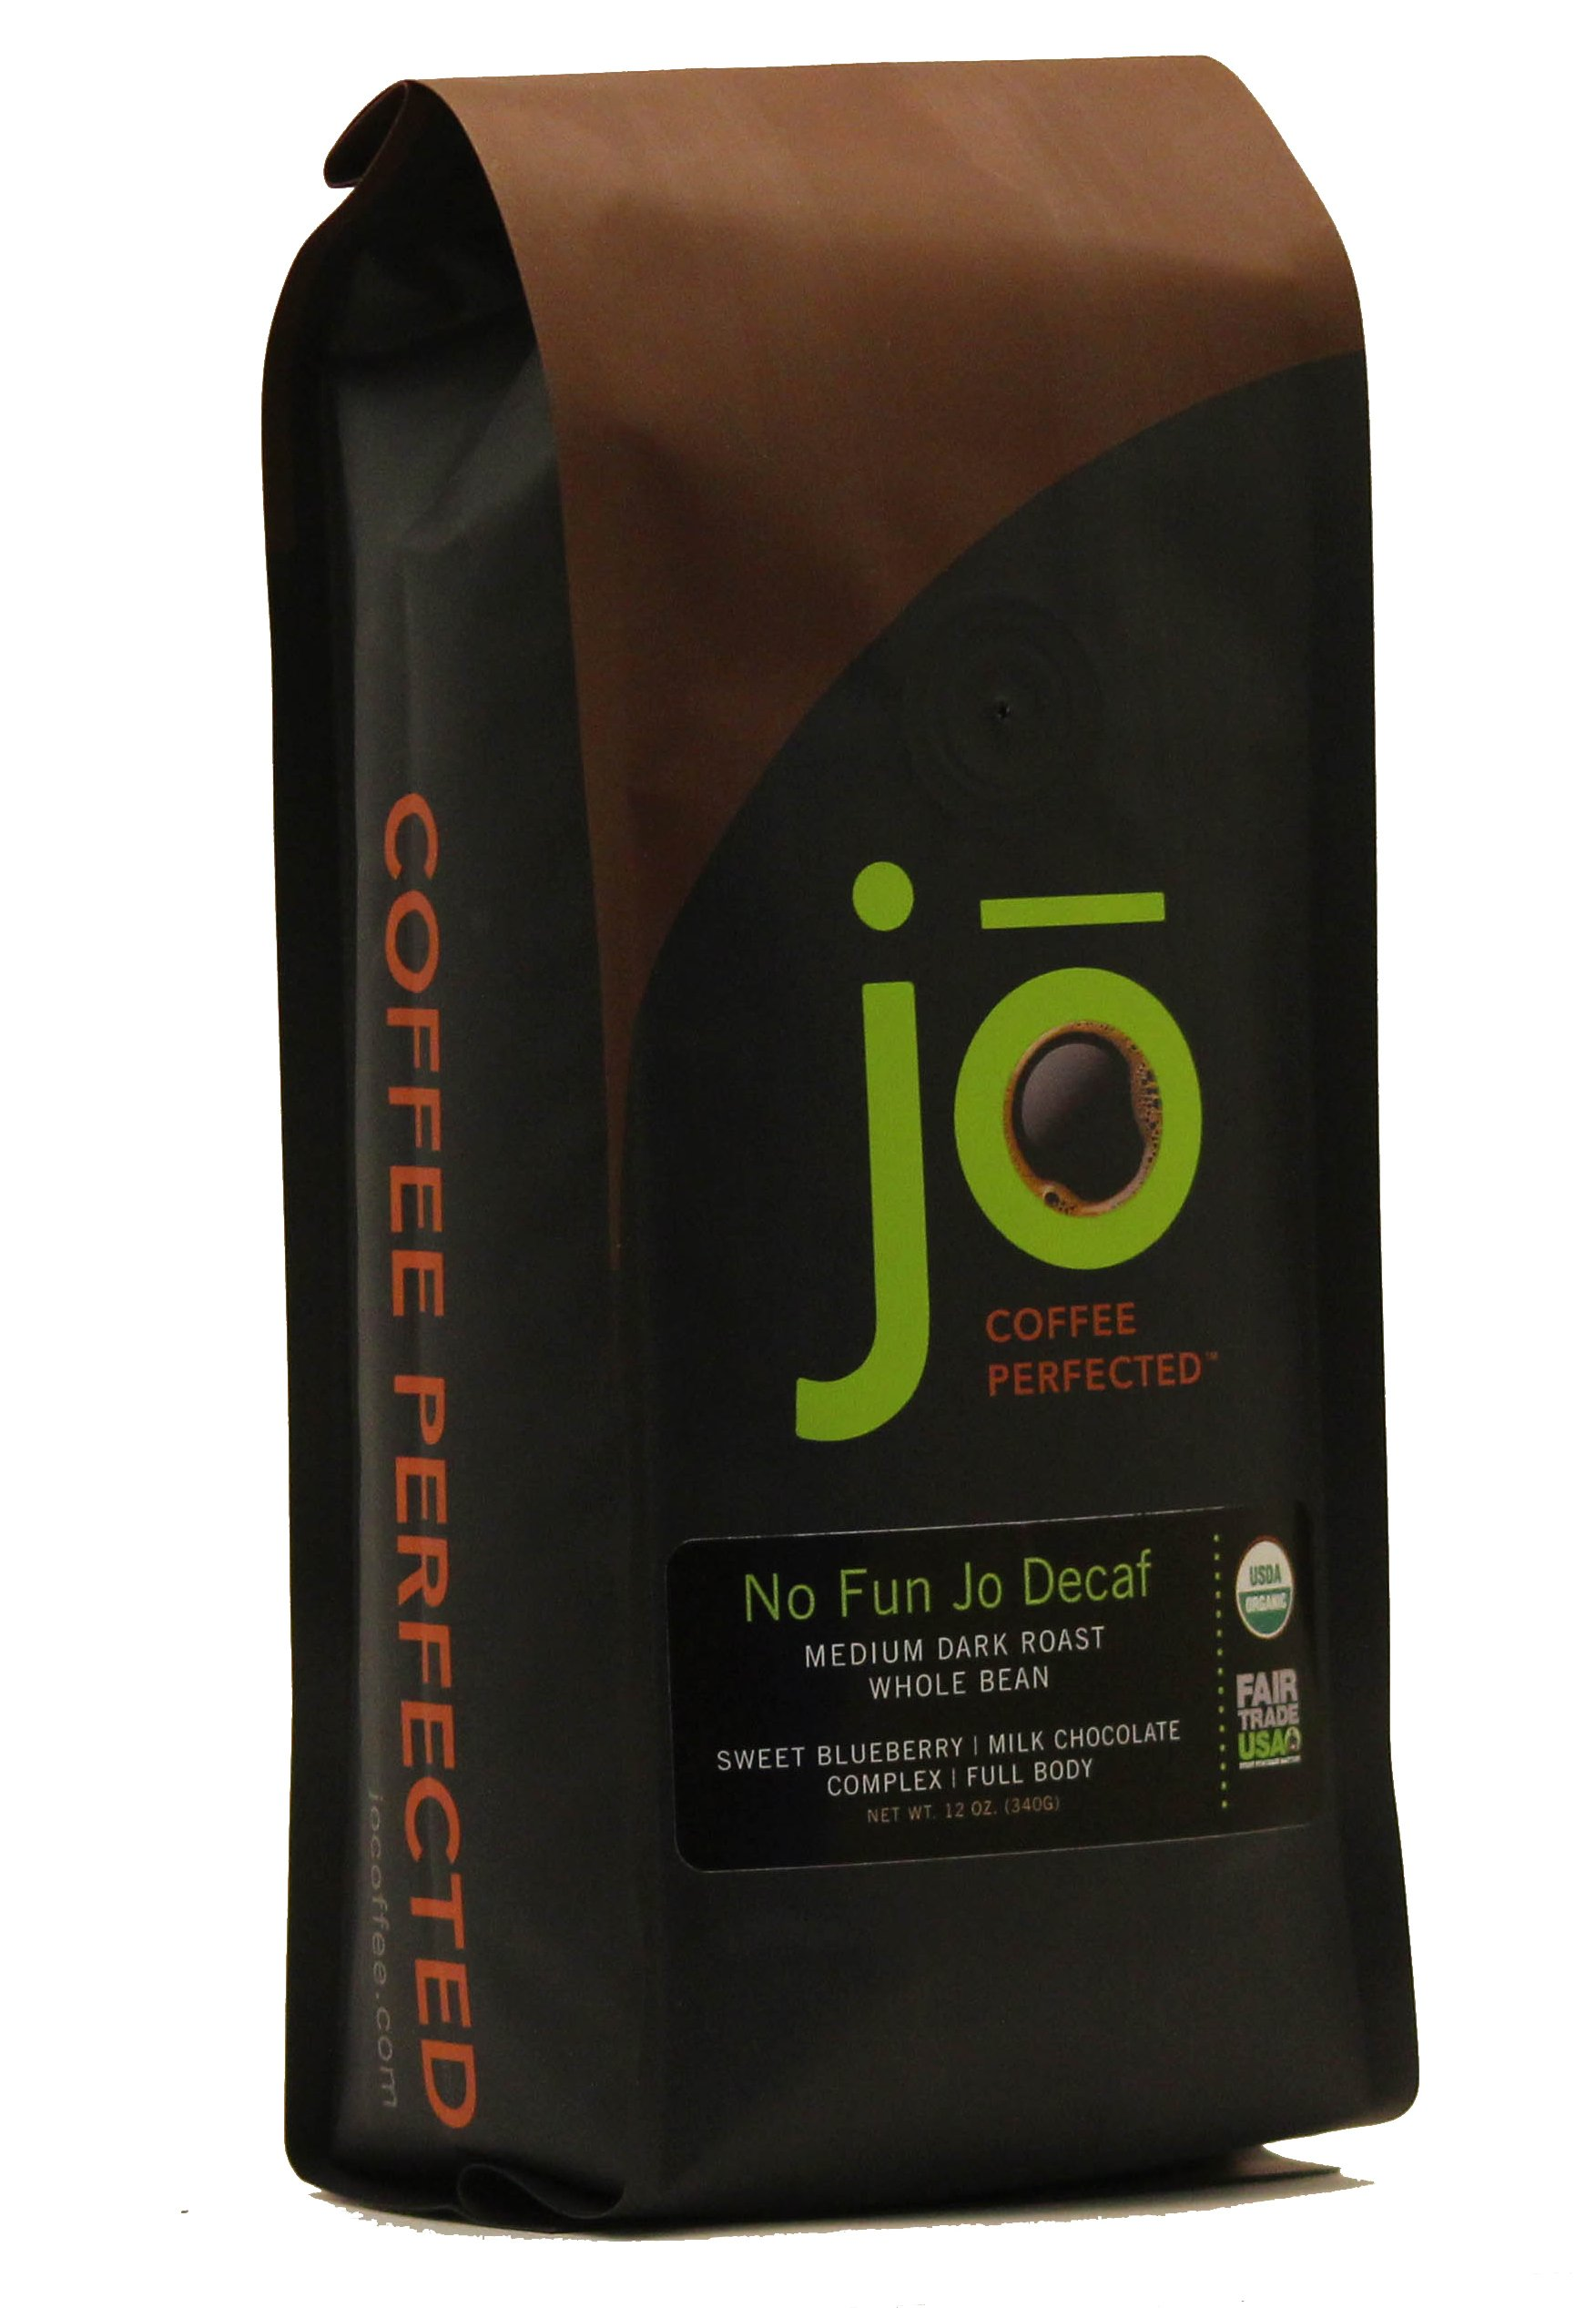 NO FUN JO DECAF: 12 oz, Organic Decaf Coffee, Swiss Water Process, Fair Trade Certified, Medium Dark Roast, Whole Bean Arabica Coffee, USDA Certified Organic, Chemical Free, Brewed or Decaf Espresso